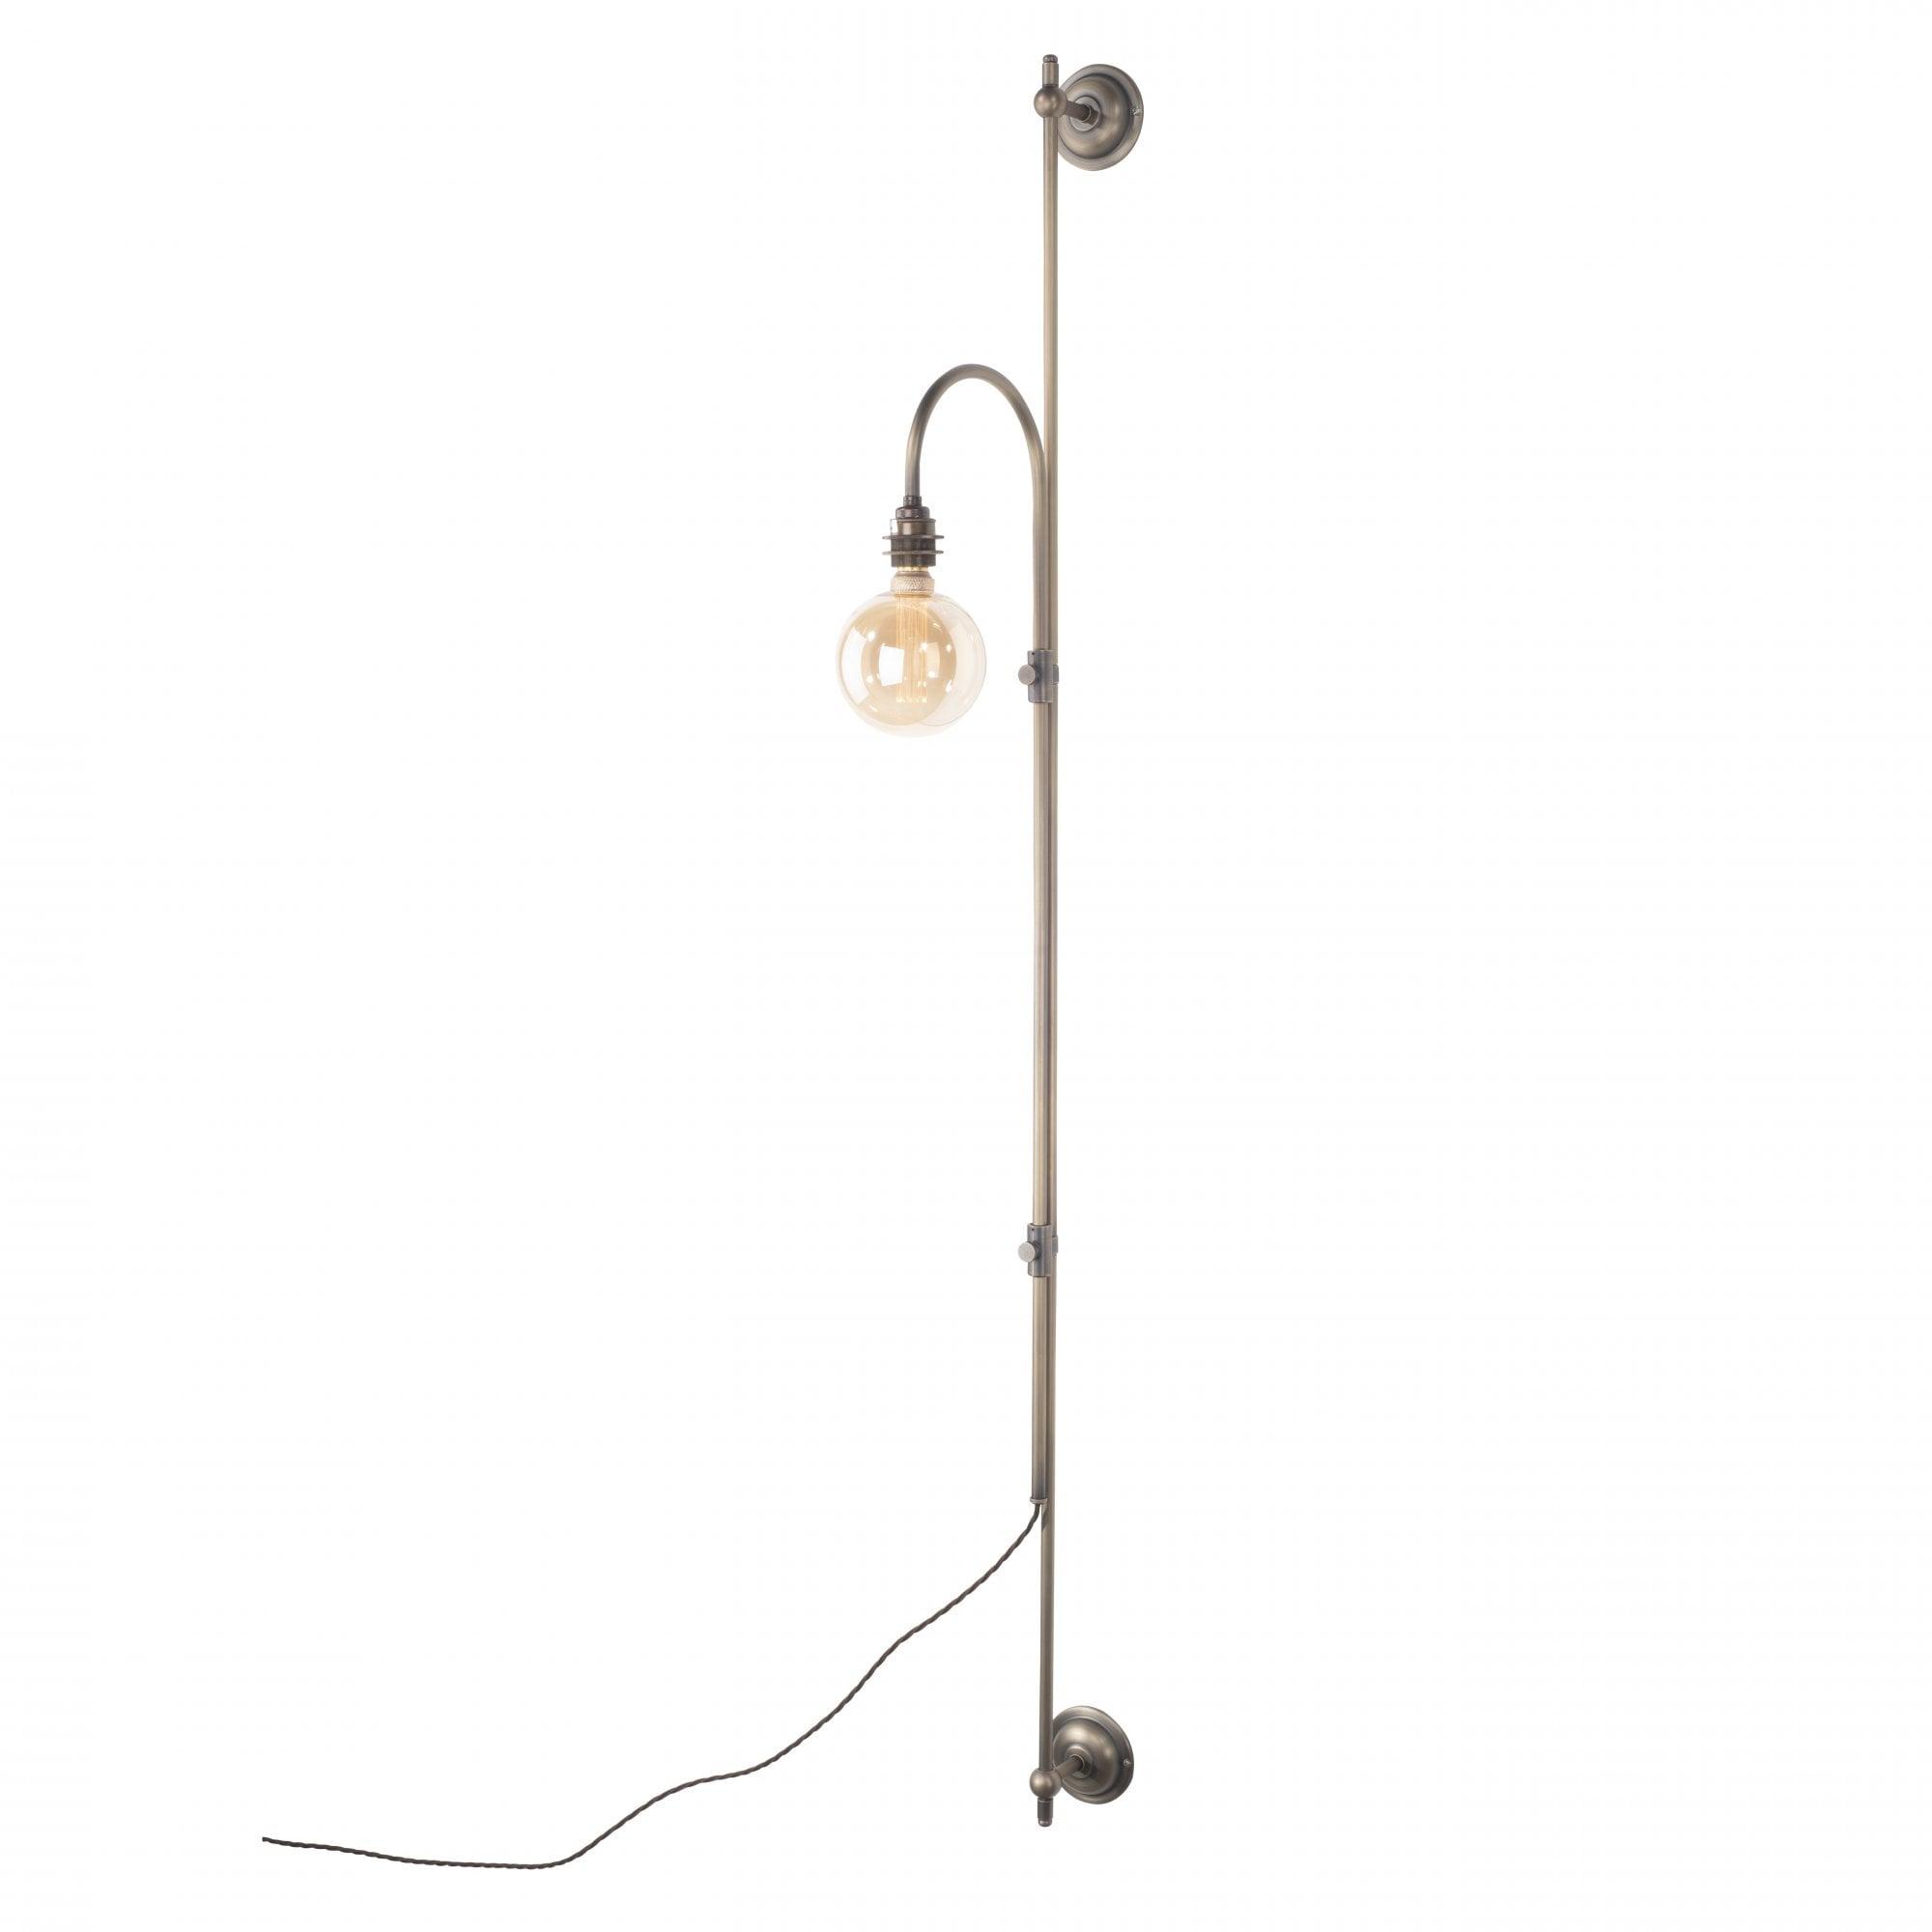 Image of: Wall Mounted Light Plug In Designer Wall Light Tall Wall Light